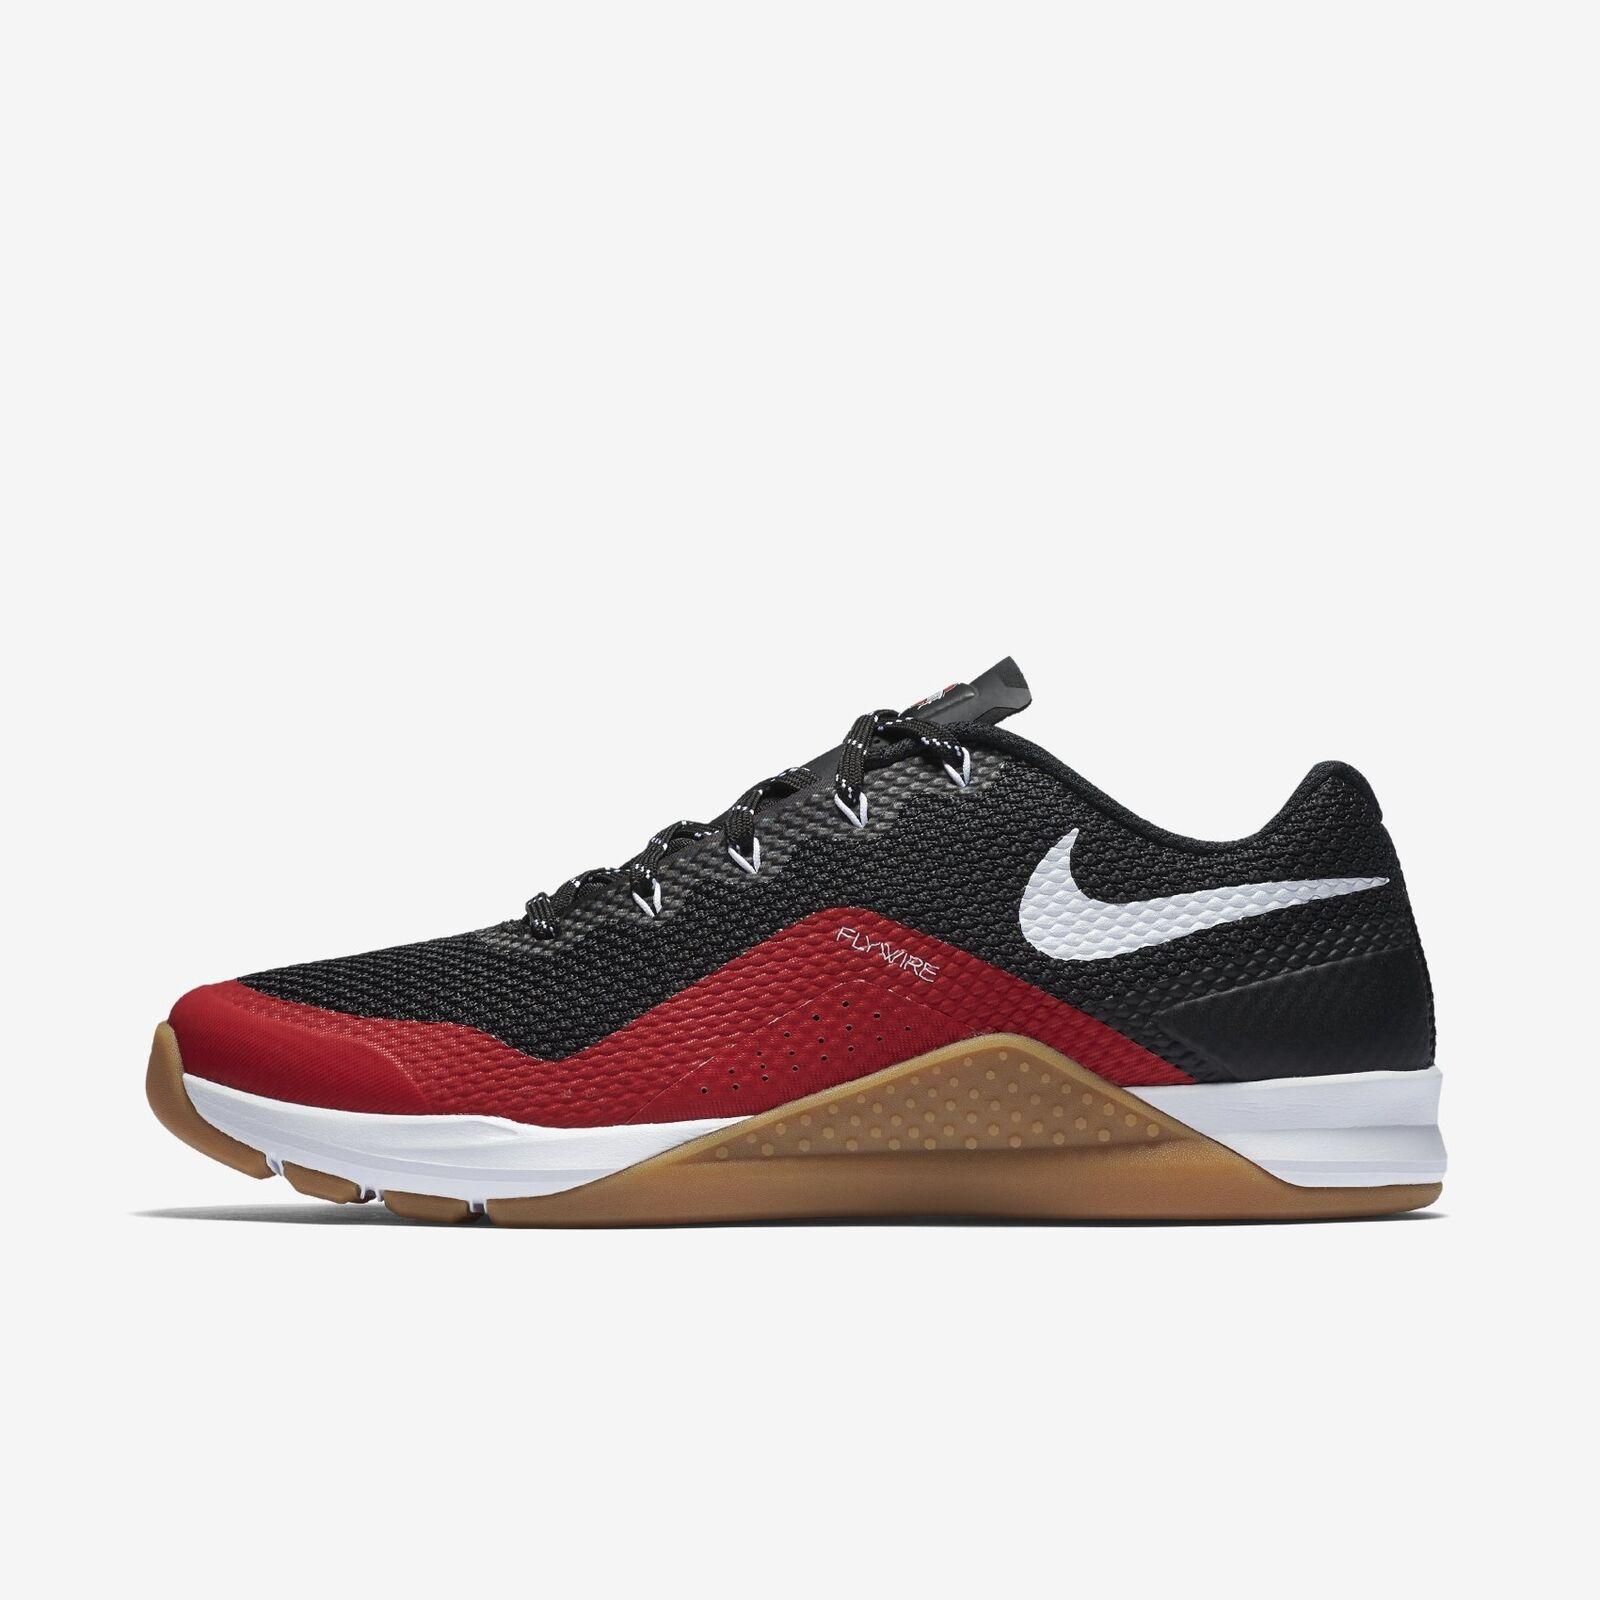 Men's Nike Metcon Repper DSX College Ohio State Training Shoes Sz 7.5 921215 001